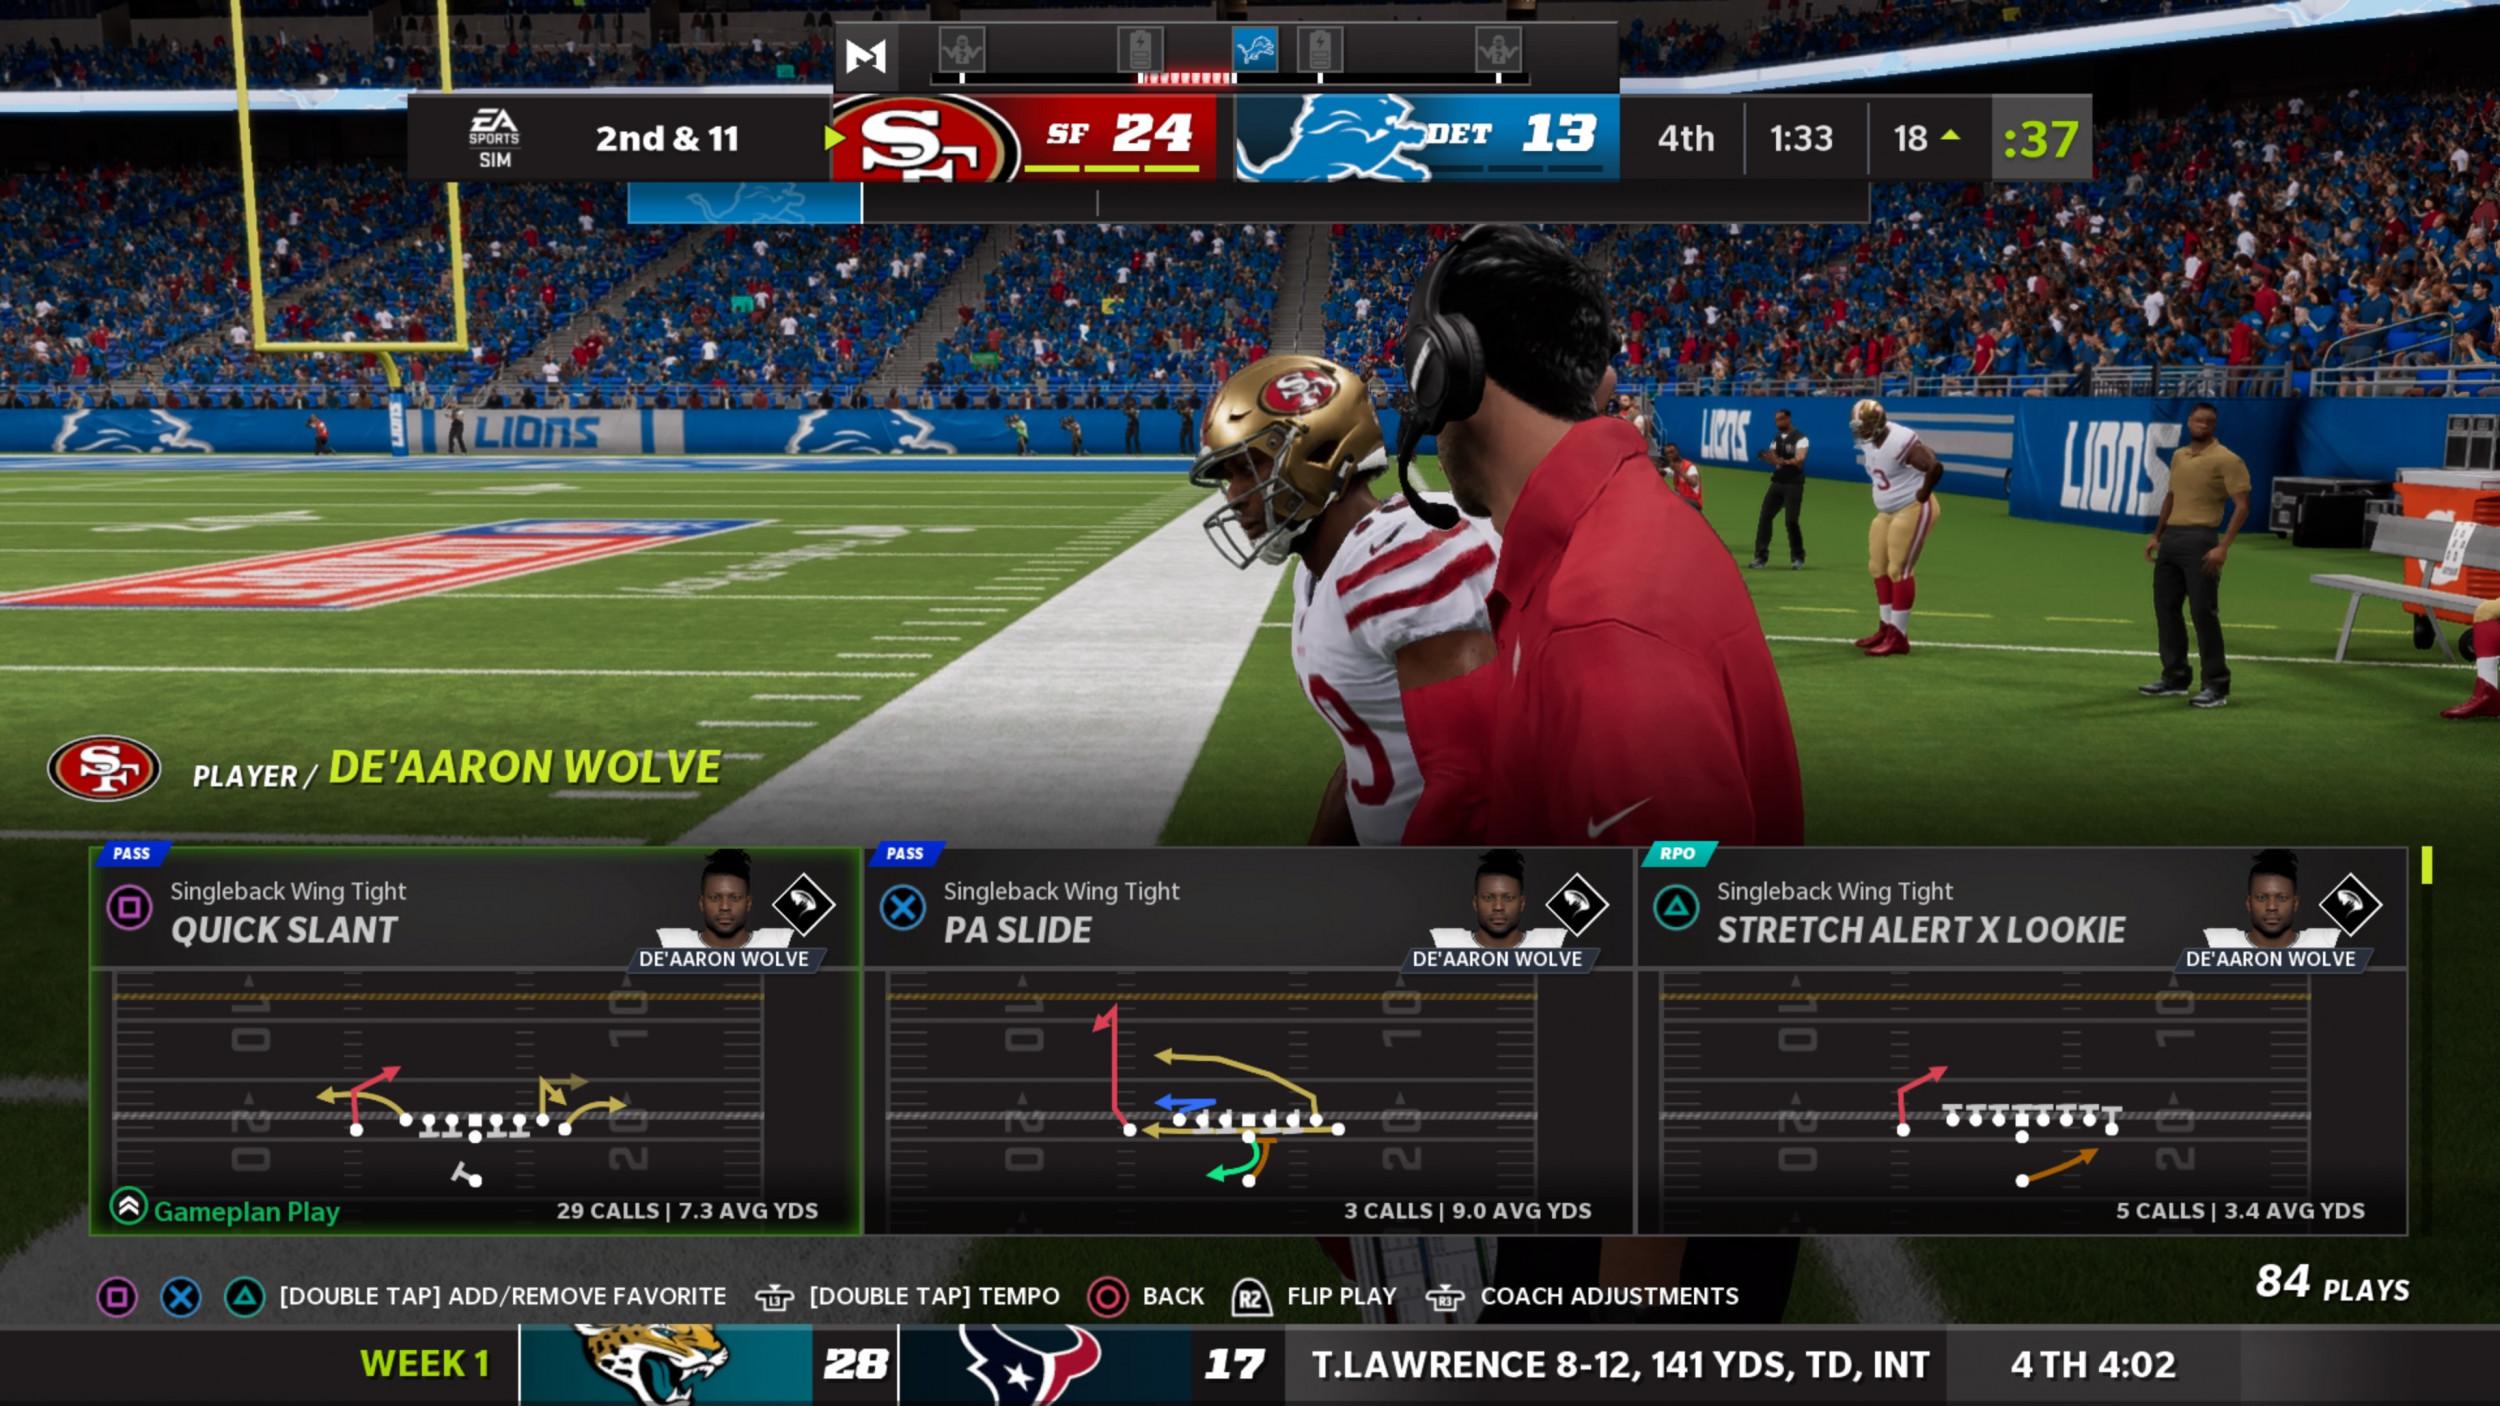 Xbox Series X & S Madden NFL 22